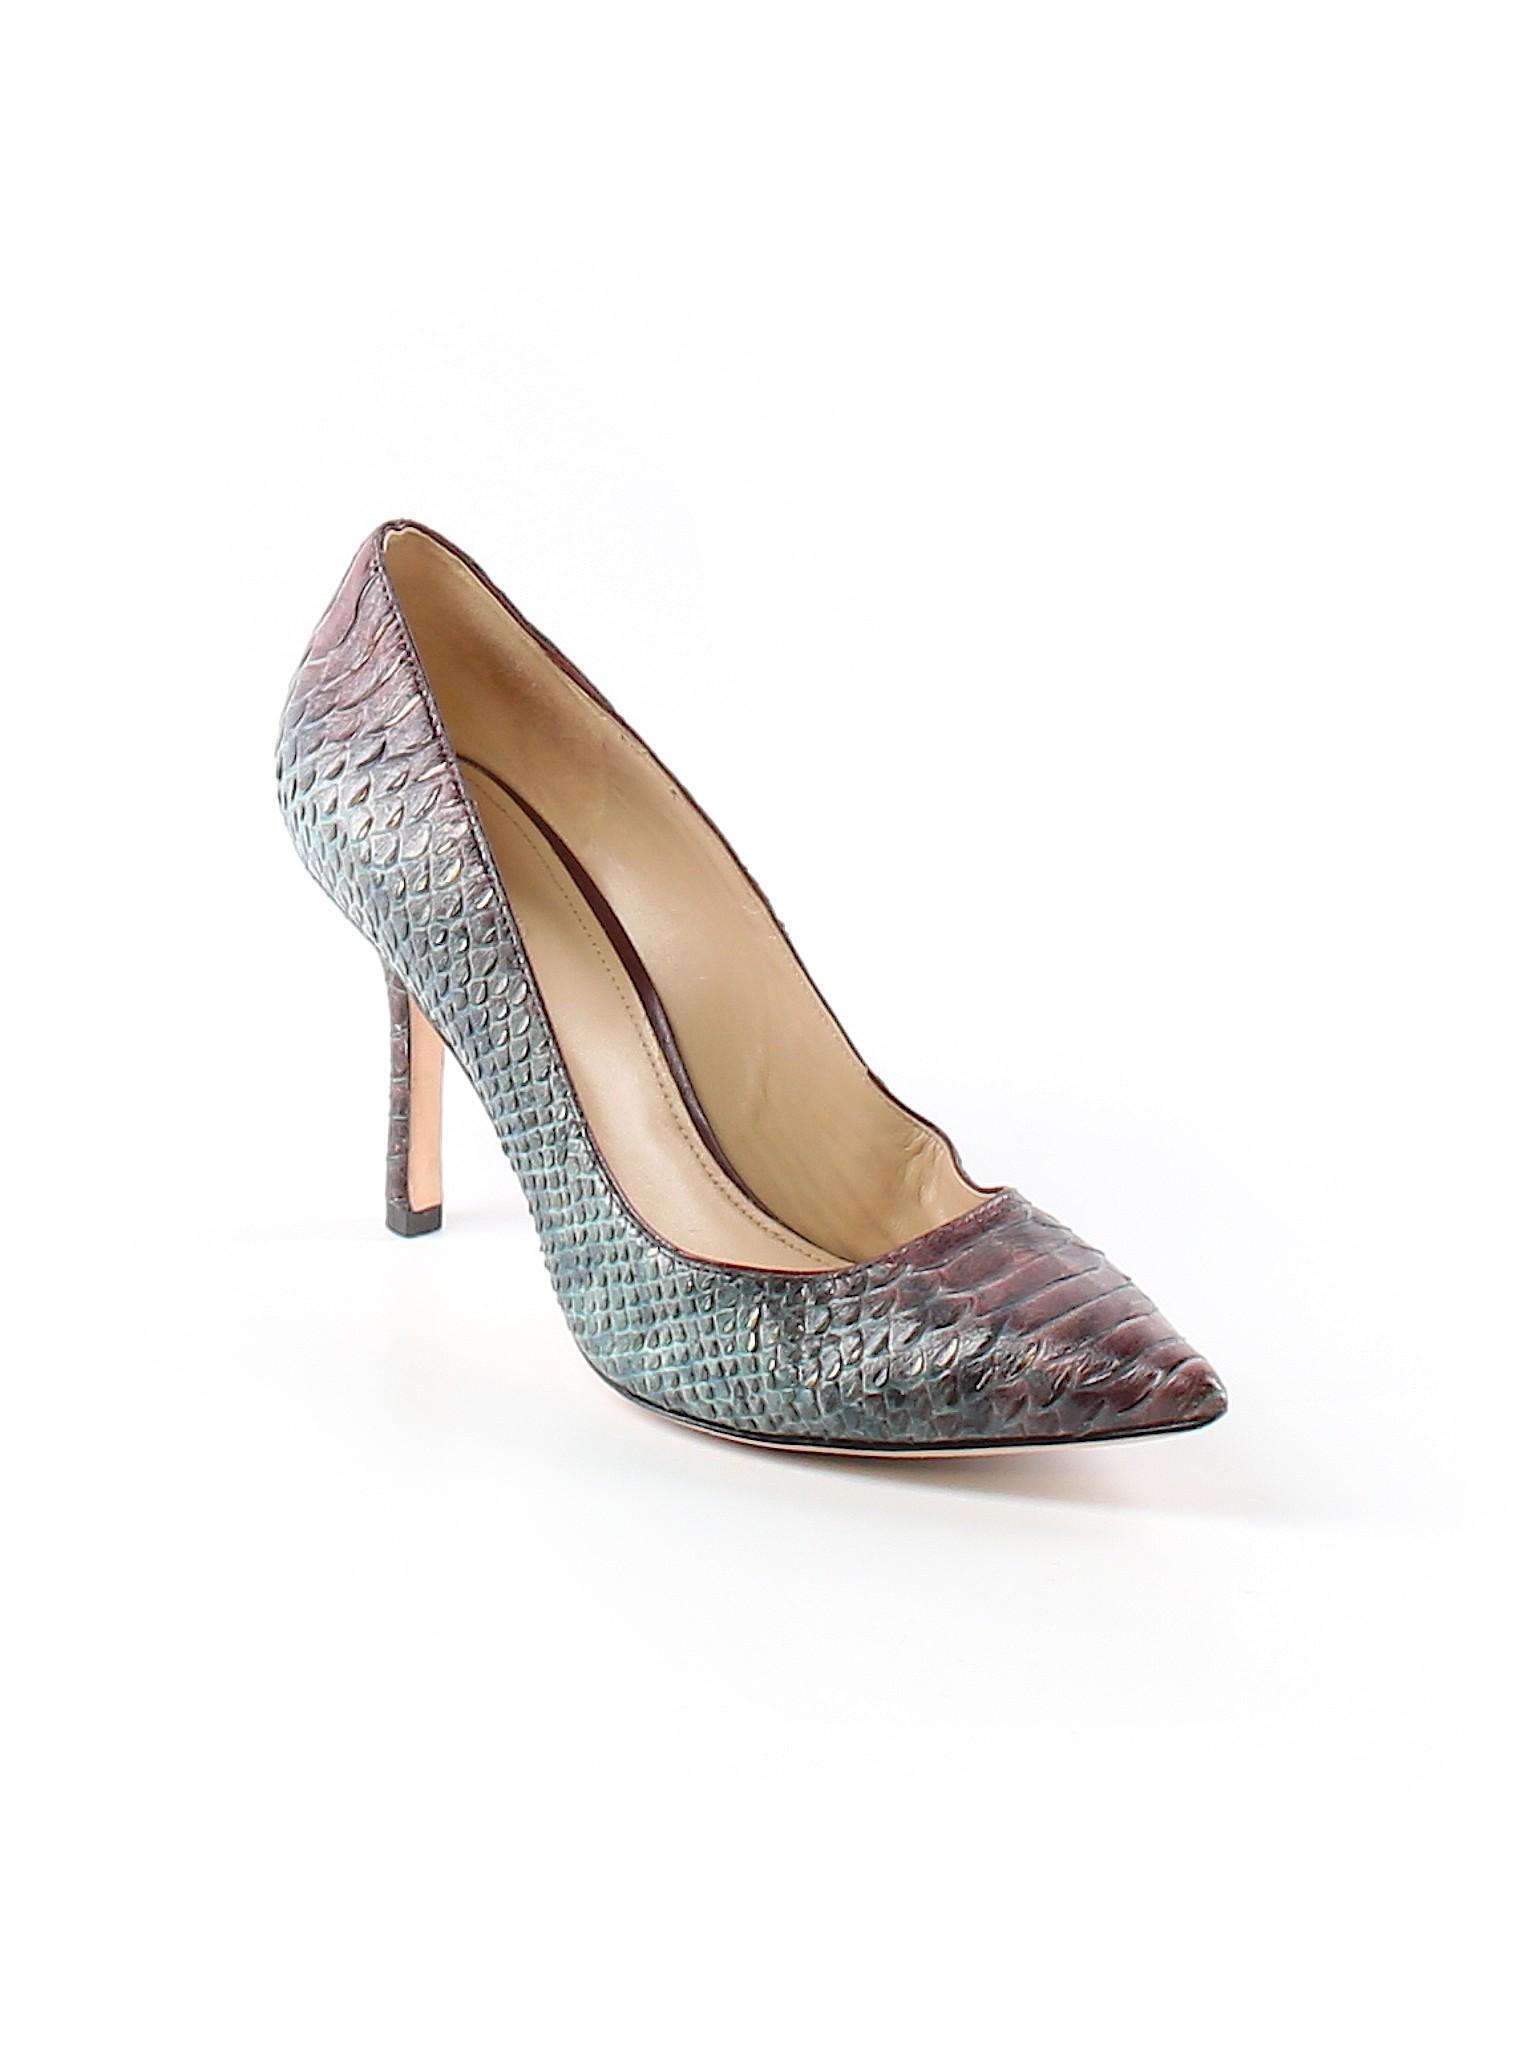 promotion Heels amp; David Joan Boutique RwdP4qq